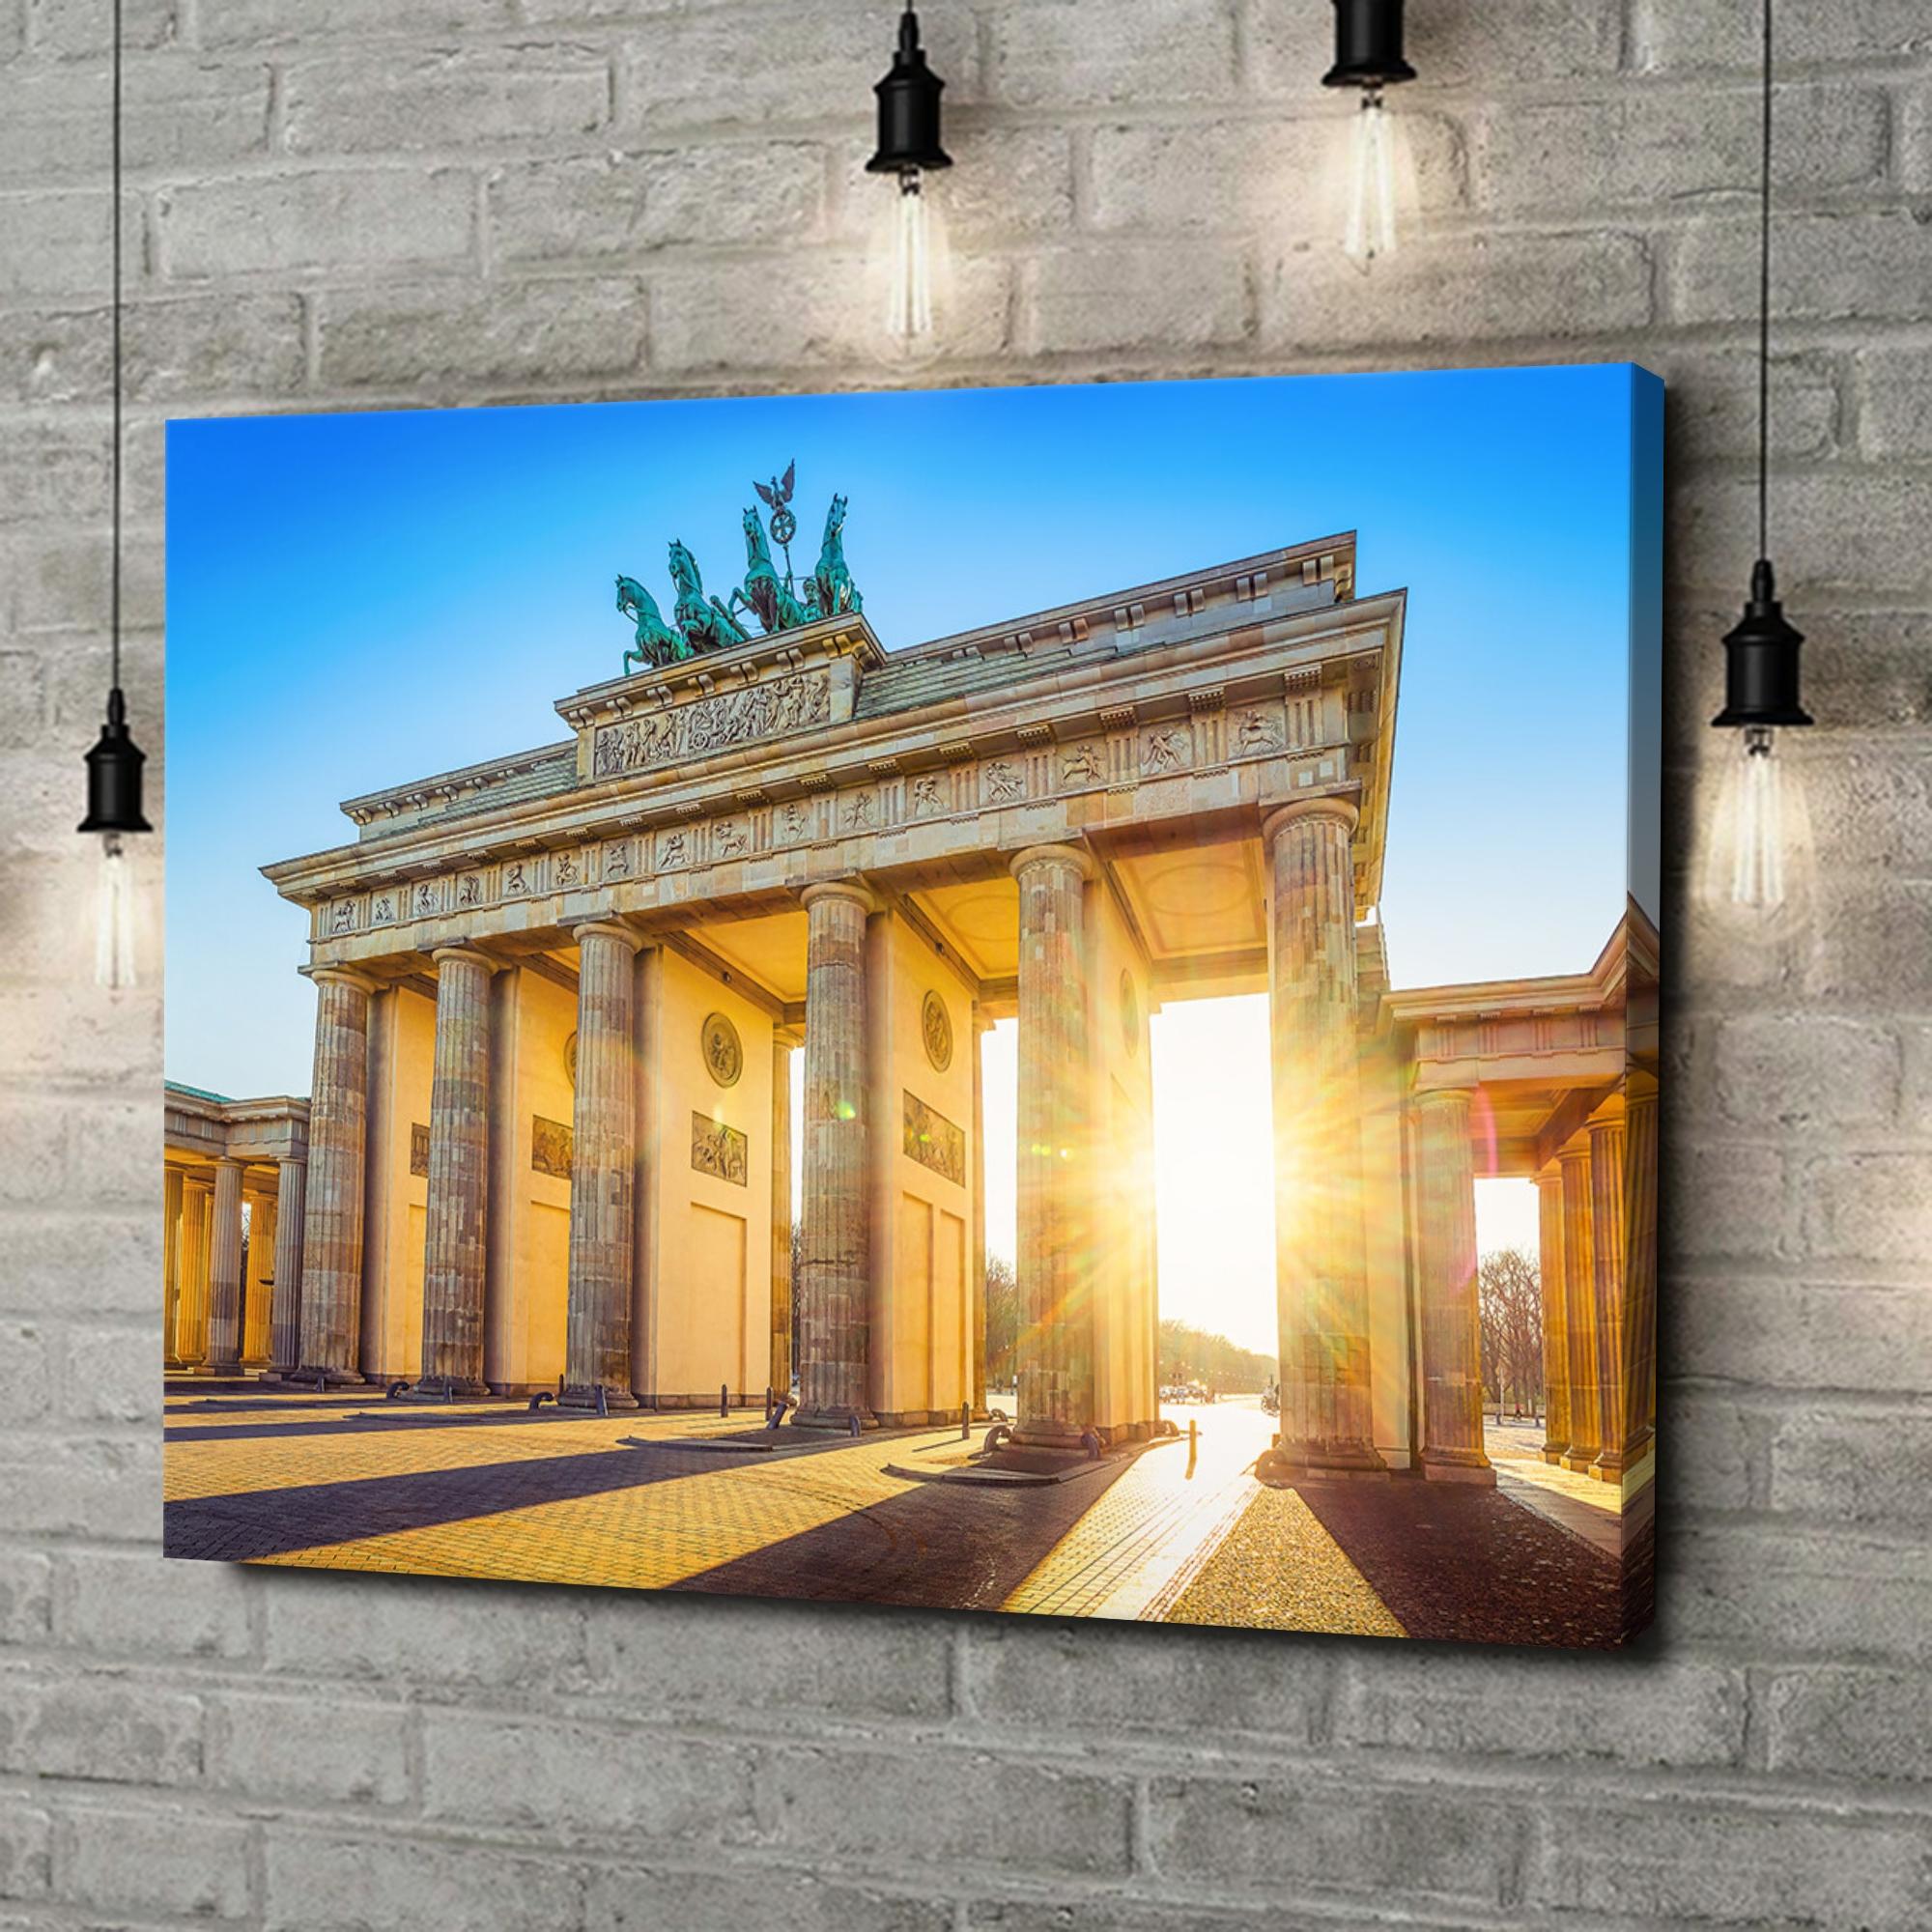 Leinwandbild personalisiert Brandenburger Tor